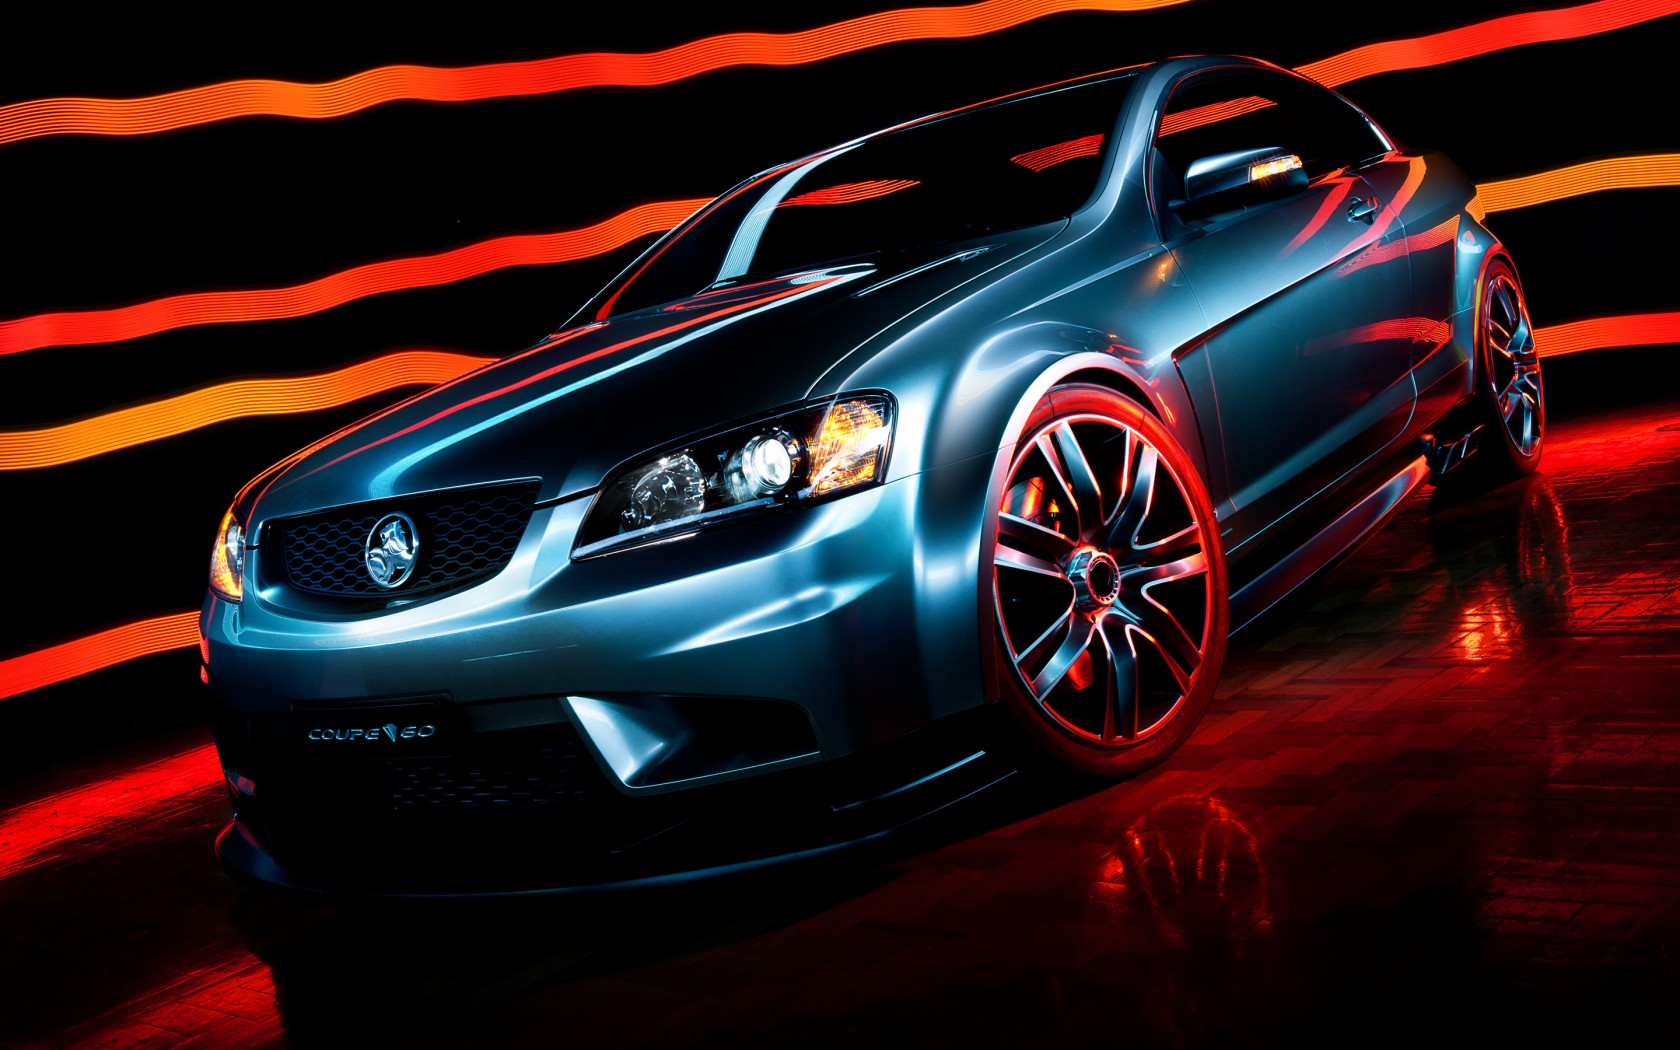 Jaguar Car Logo Hd Wallpaper Download Holden Coupe 60 Concept Wallpaper Hd Car Wallpapers Id